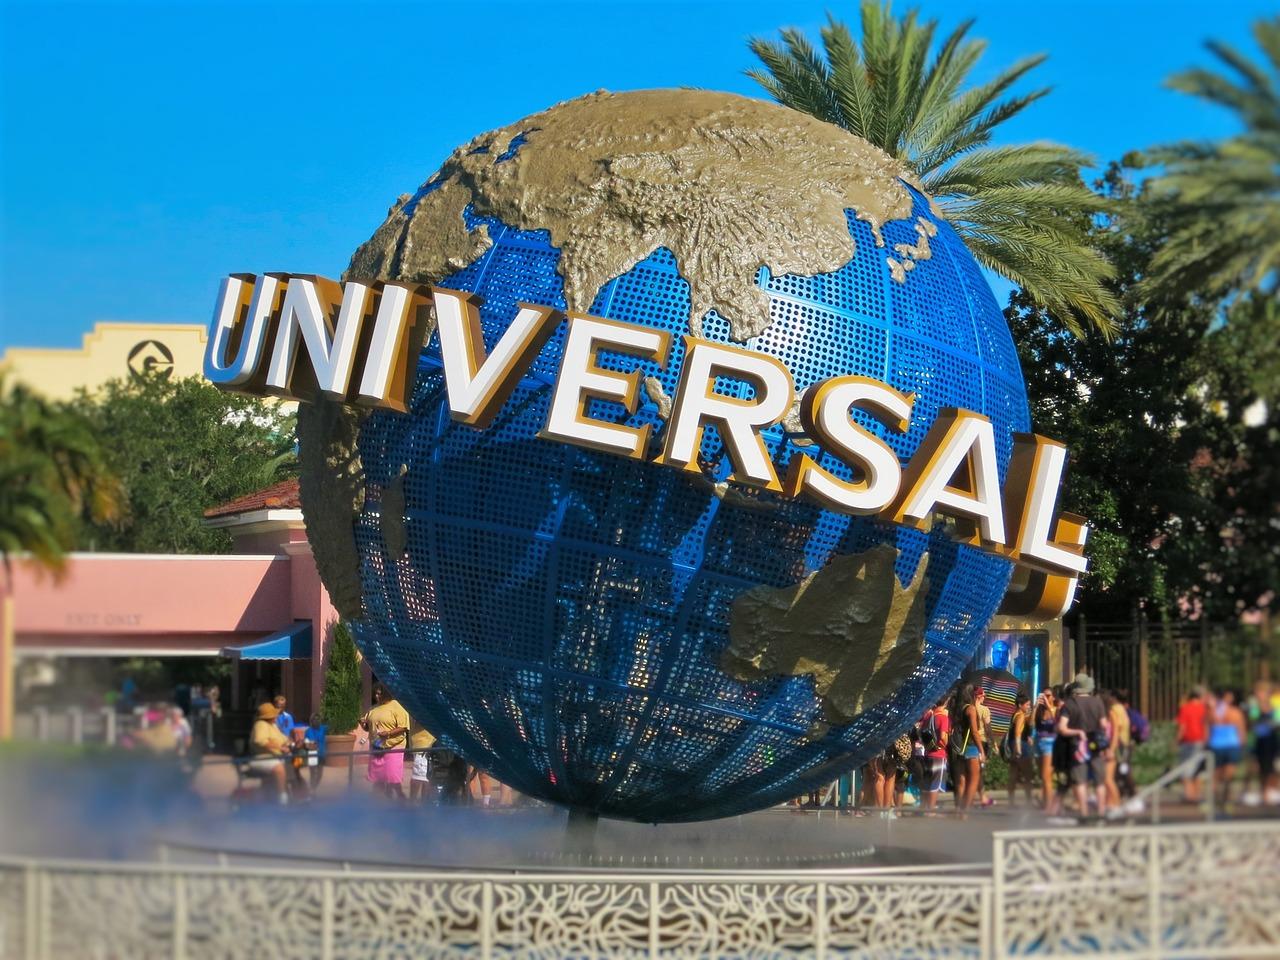 universal orlando summer 2019 trip report part 1 universal globe.jpg